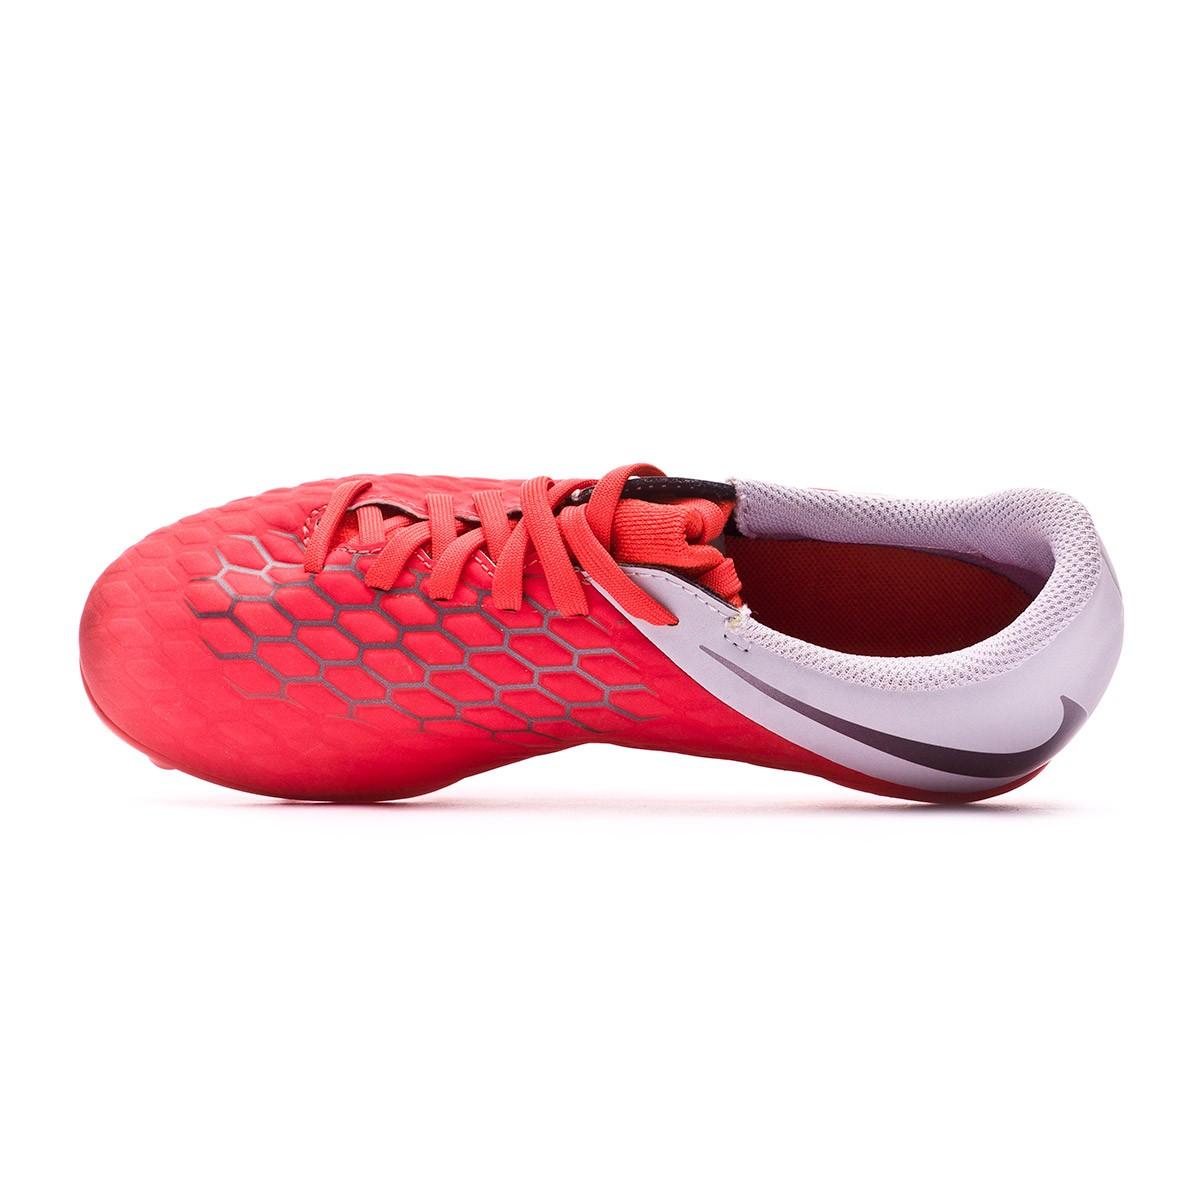 5ec861ce8221 Football Boots Nike Kids Hypervenom Phantom III Club FG Light crimson-Metallic  dark grey-Wolf grey - Football store Fútbol Emotion